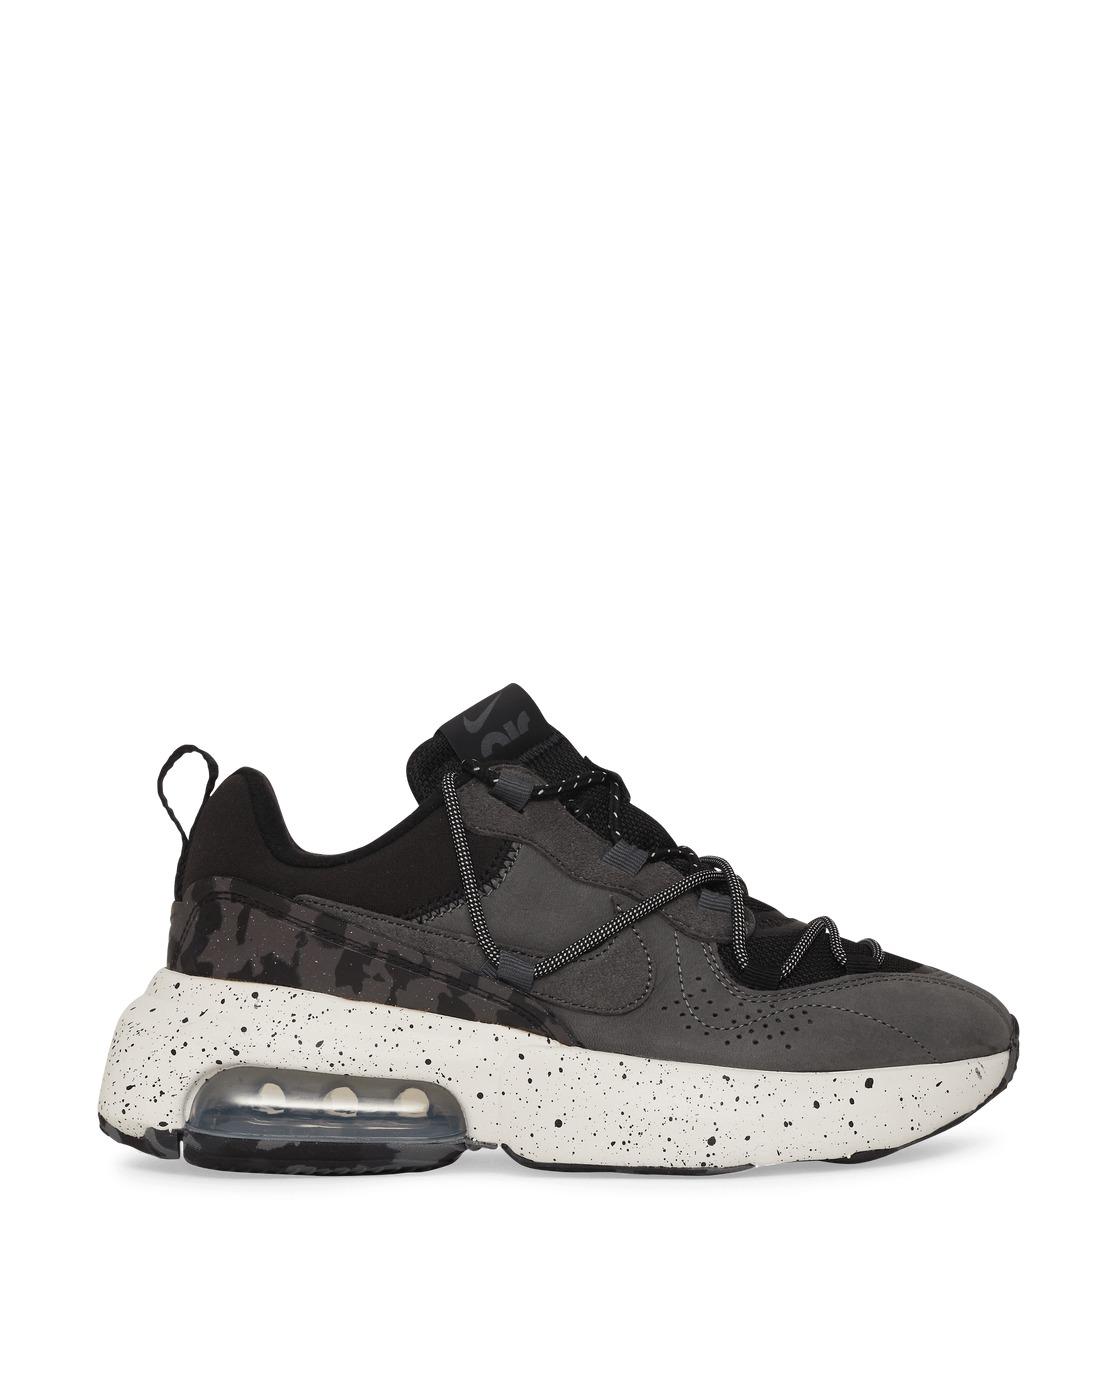 Photo: Nike Air Max Verona 2.0 Sneakers Black/Iron Grey